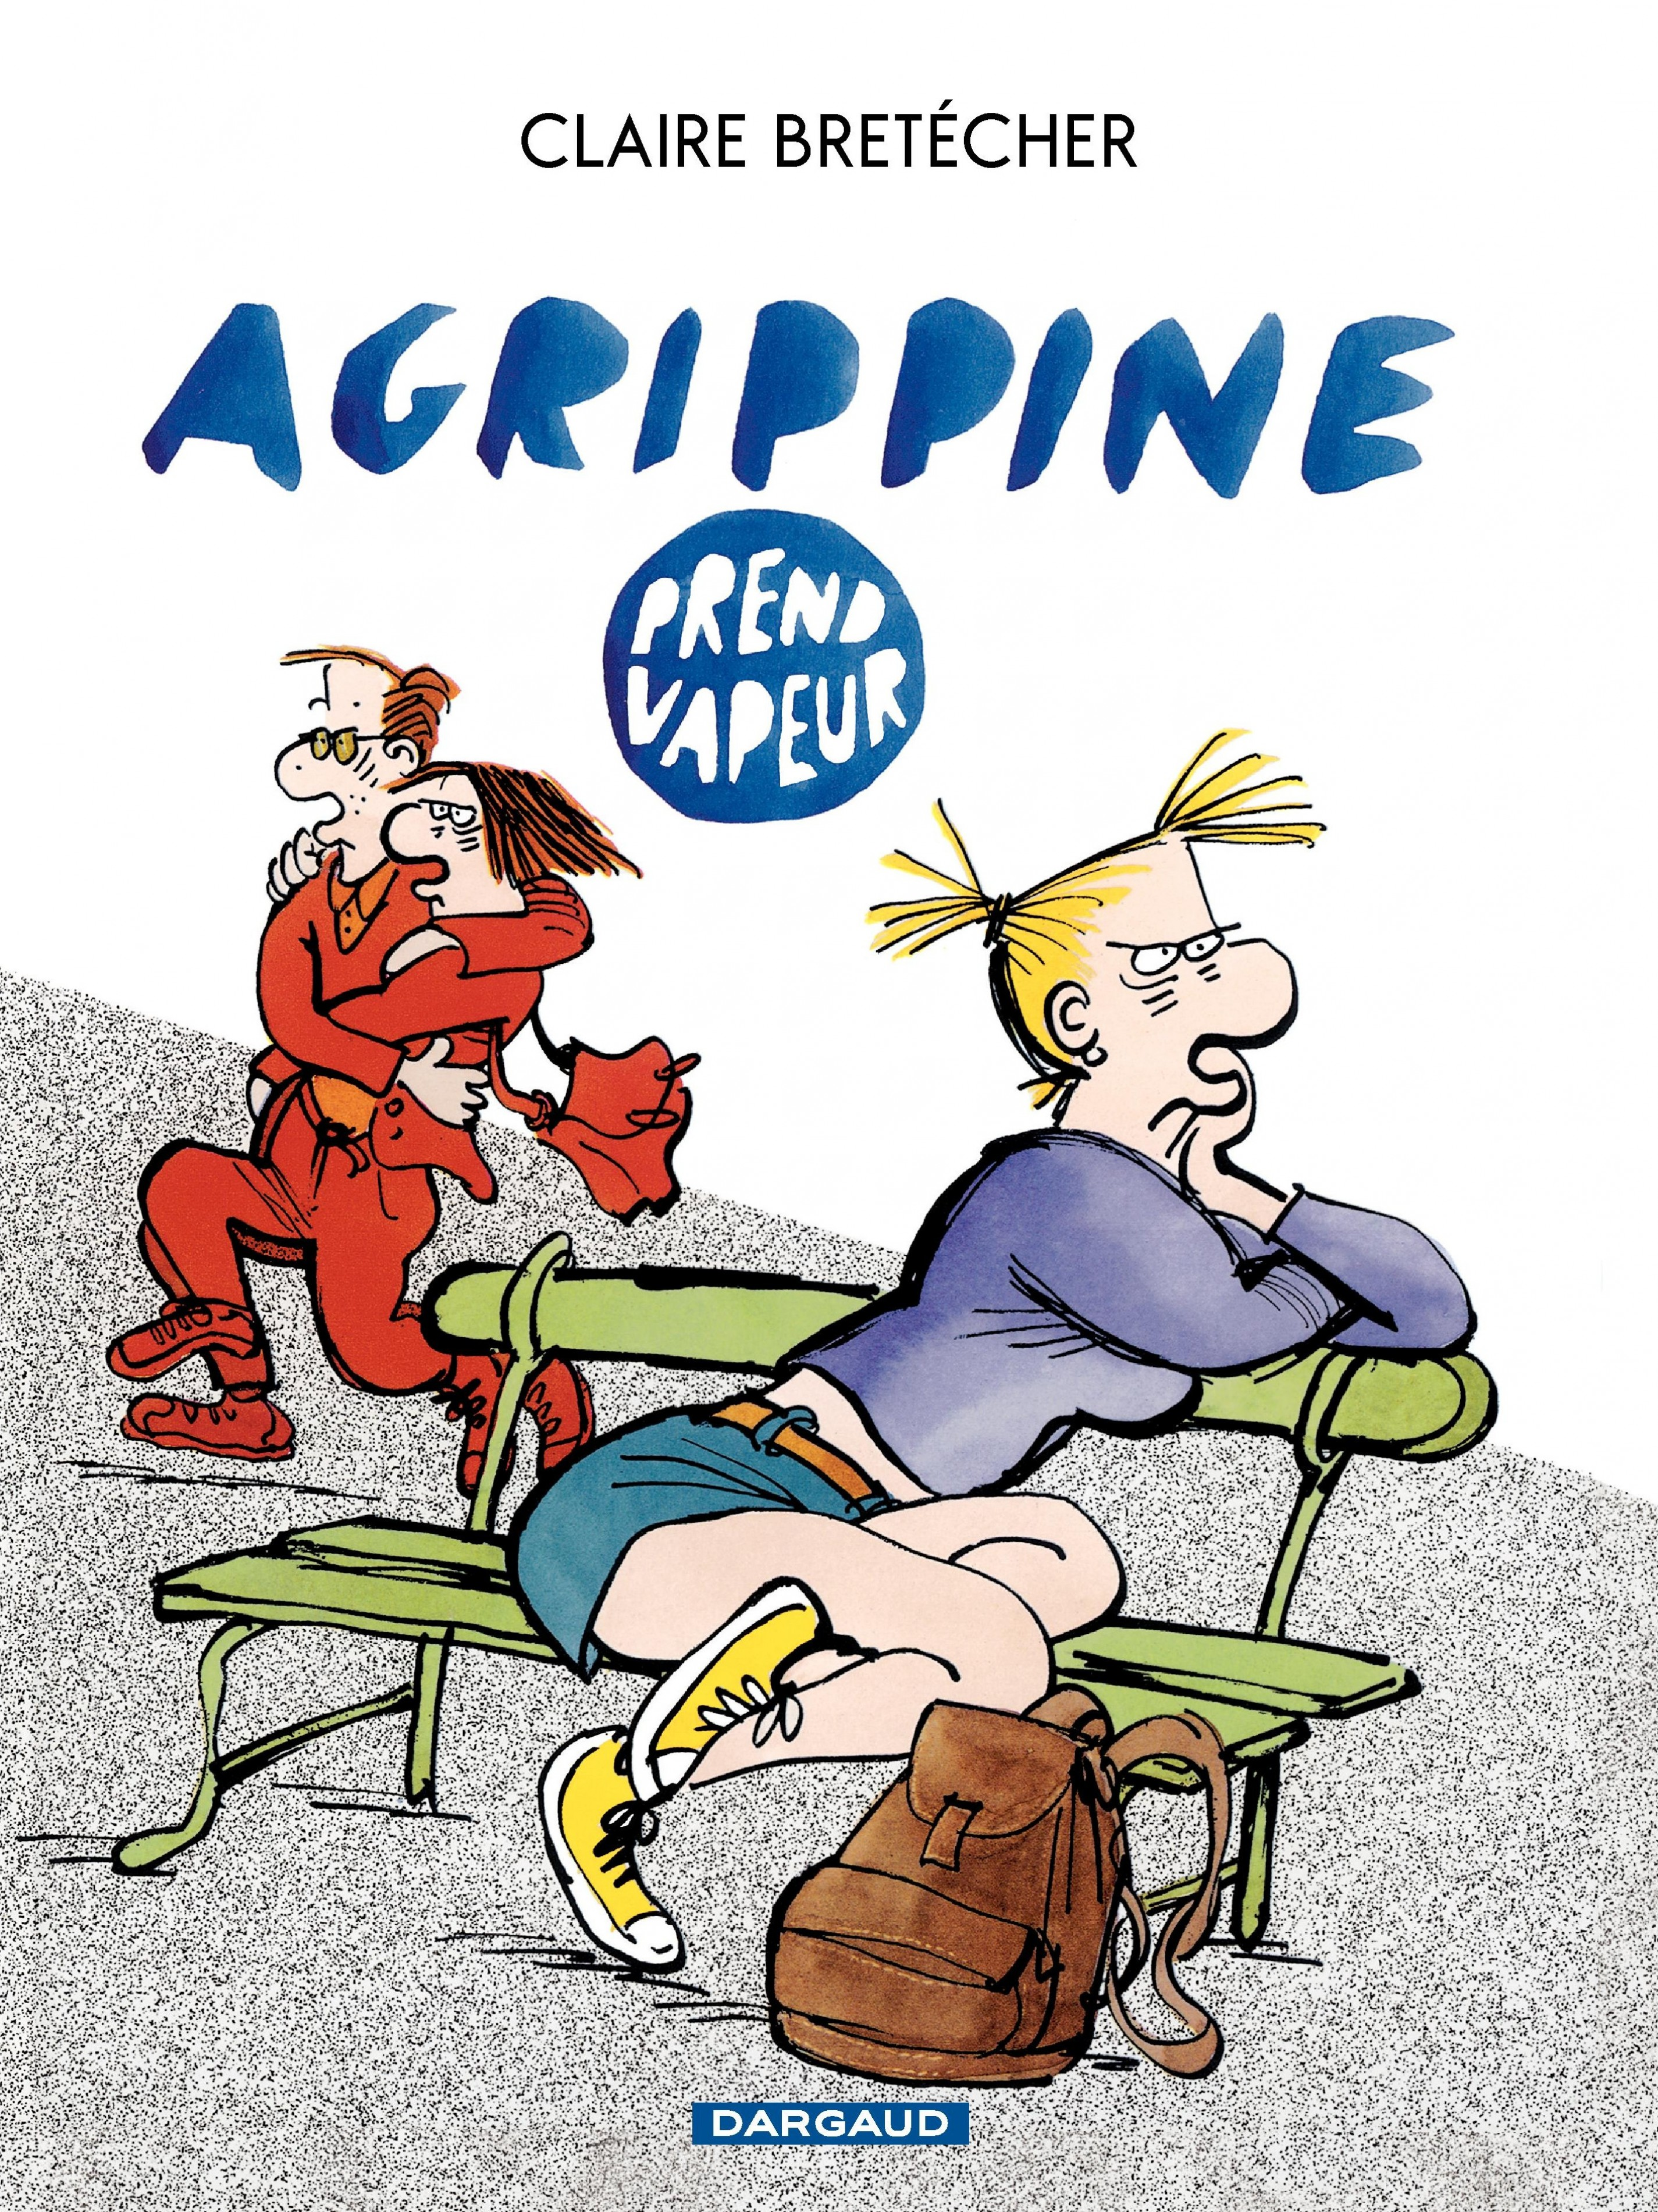 Agrippine - Tome 3 - Agrippine prend vapeur